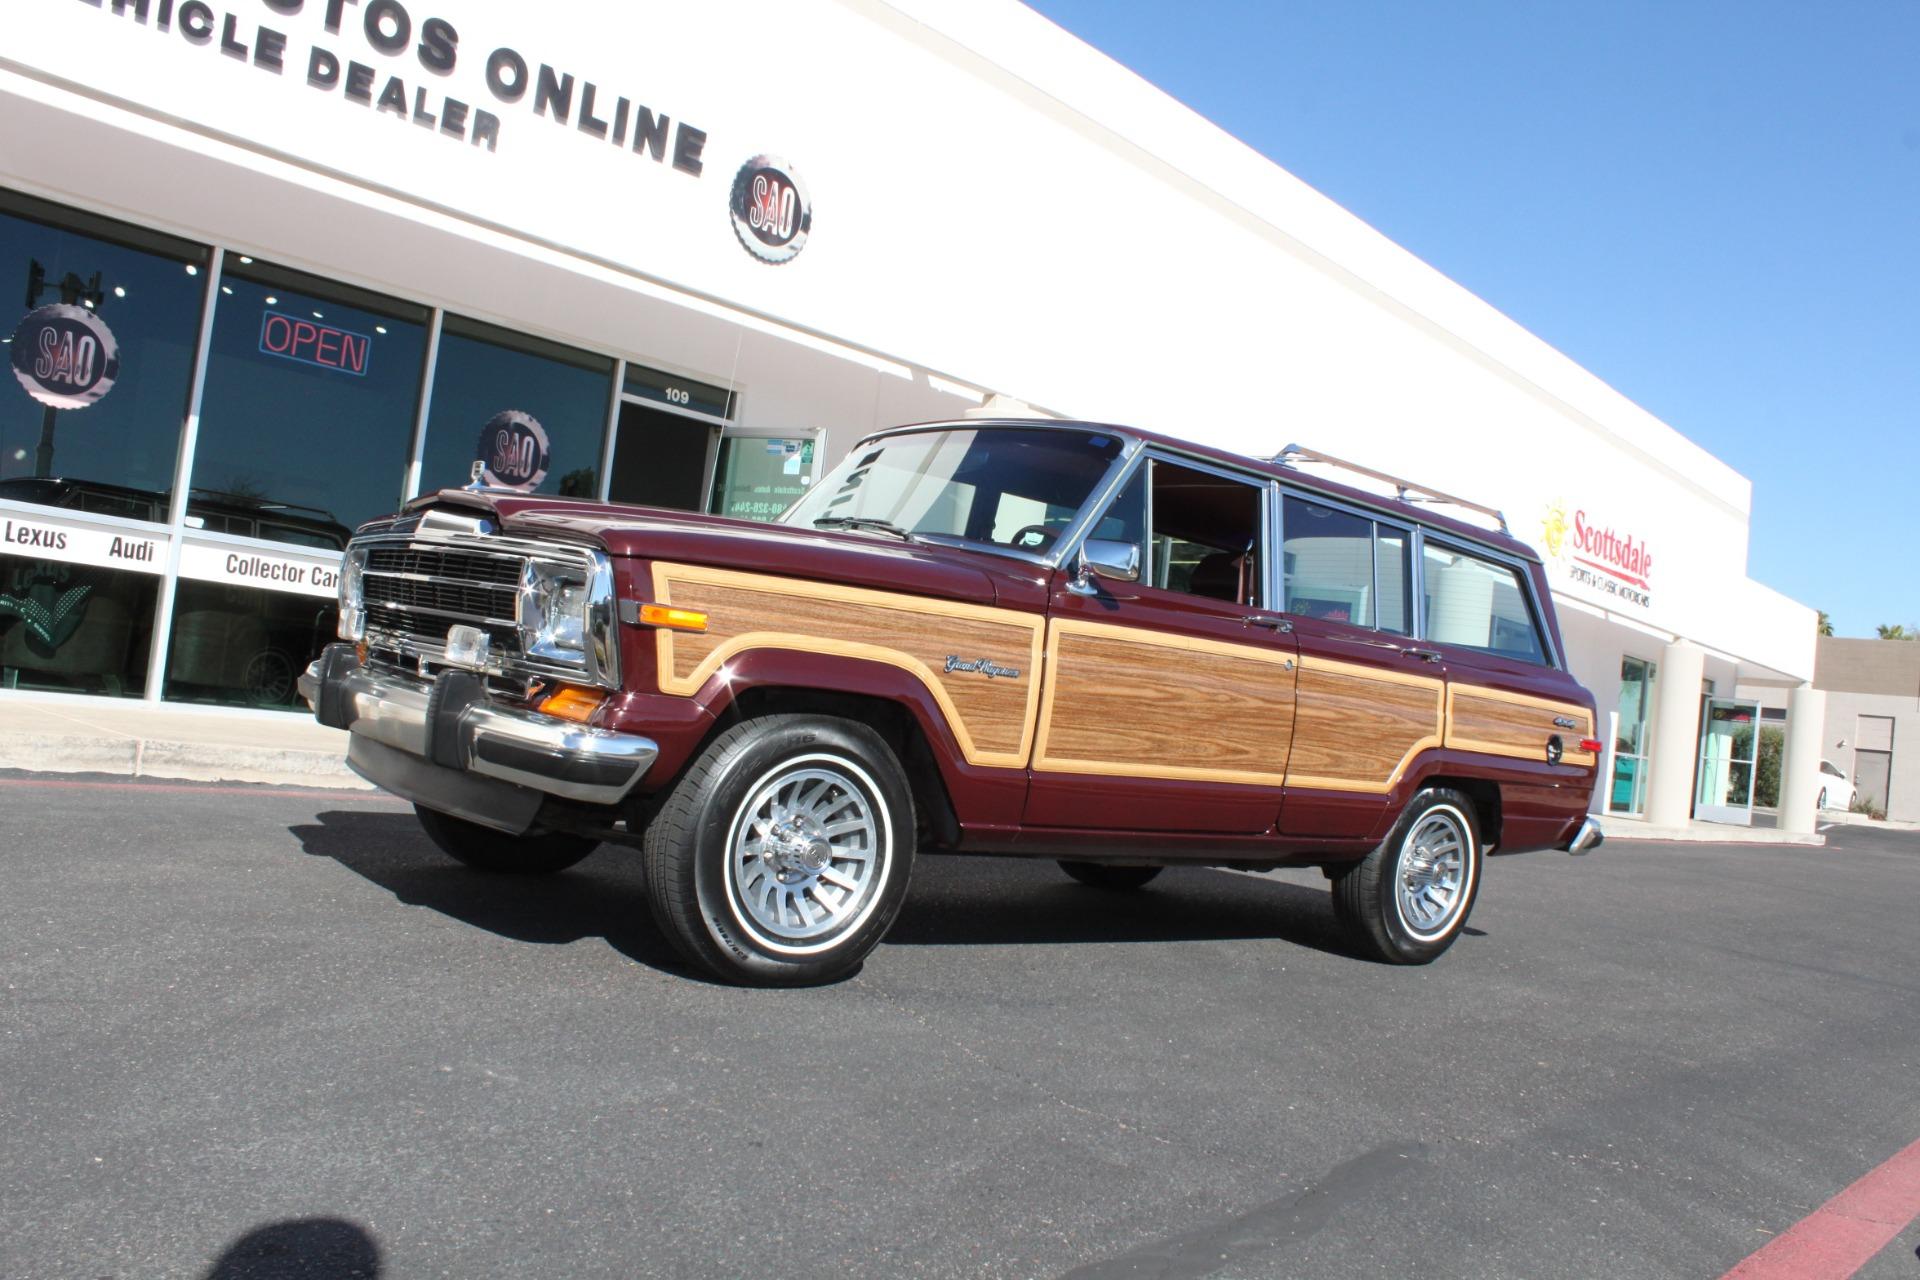 Used-1988-Jeep-Grand-Wagoneer-LS400